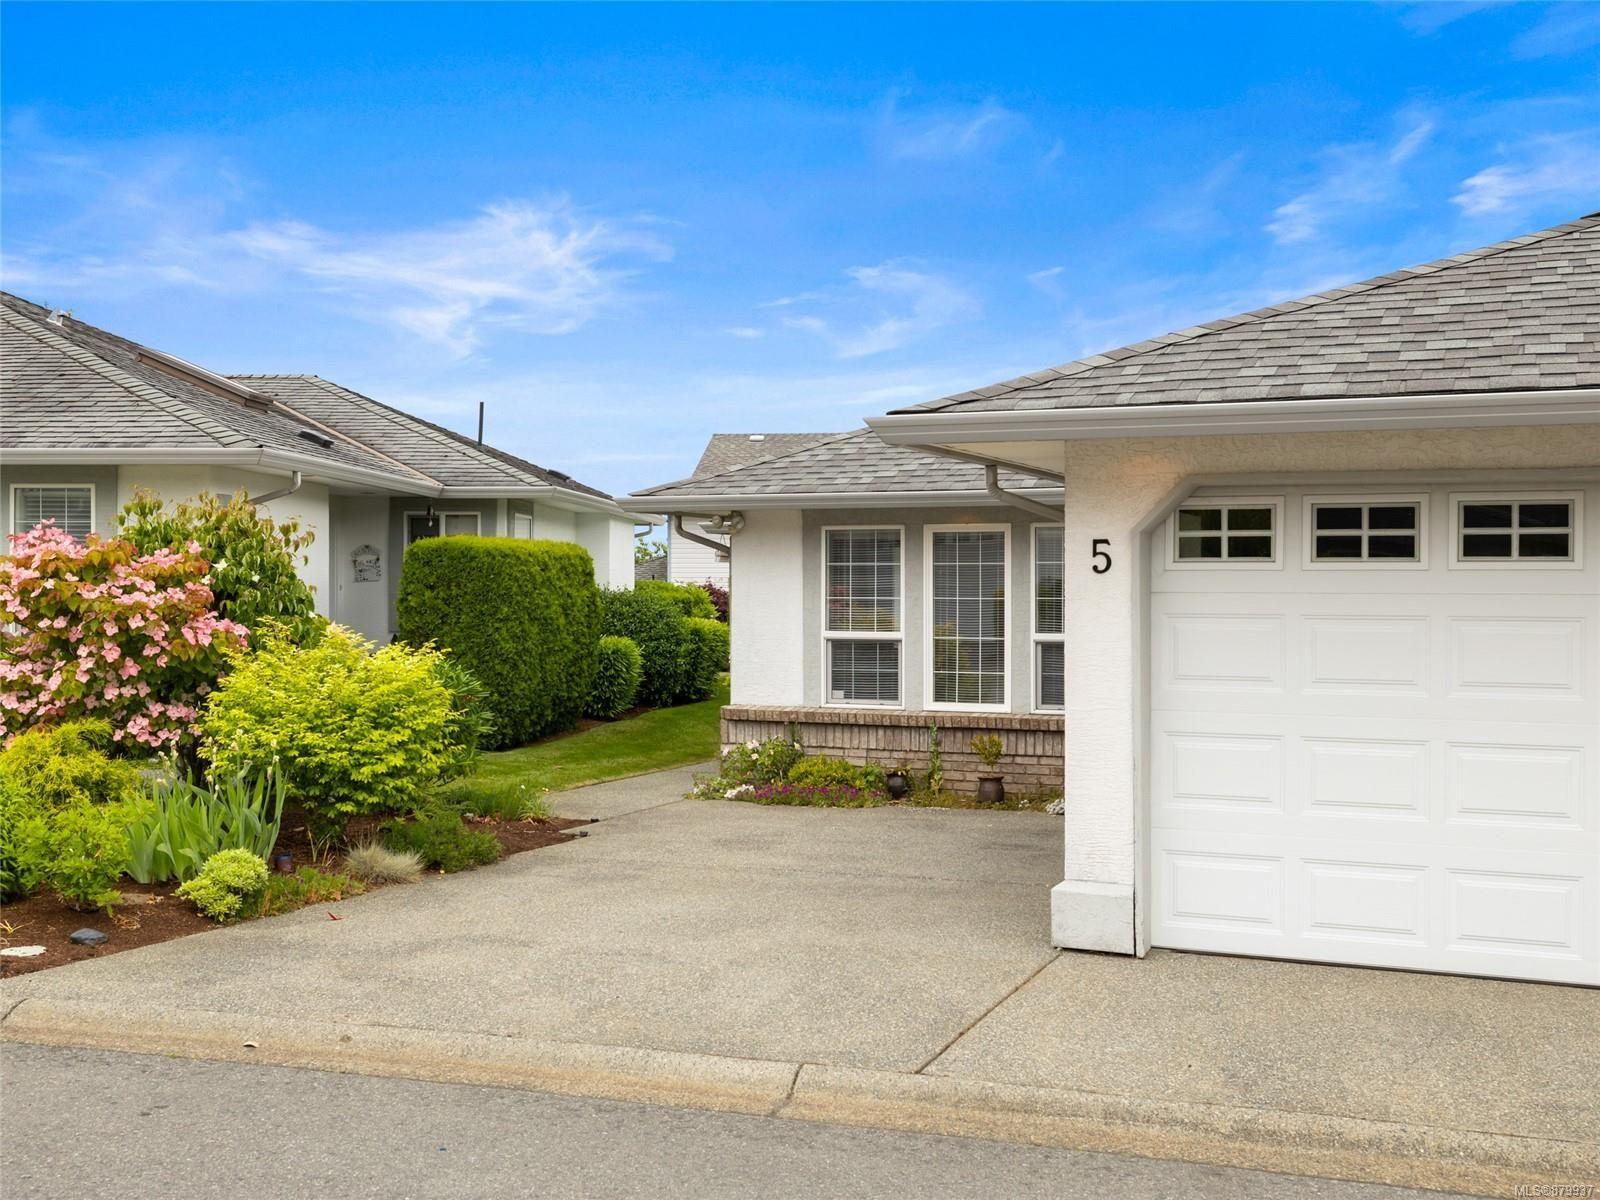 Main Photo: 5 6595 Groveland Dr in Nanaimo: Na North Nanaimo Row/Townhouse for sale : MLS®# 879937